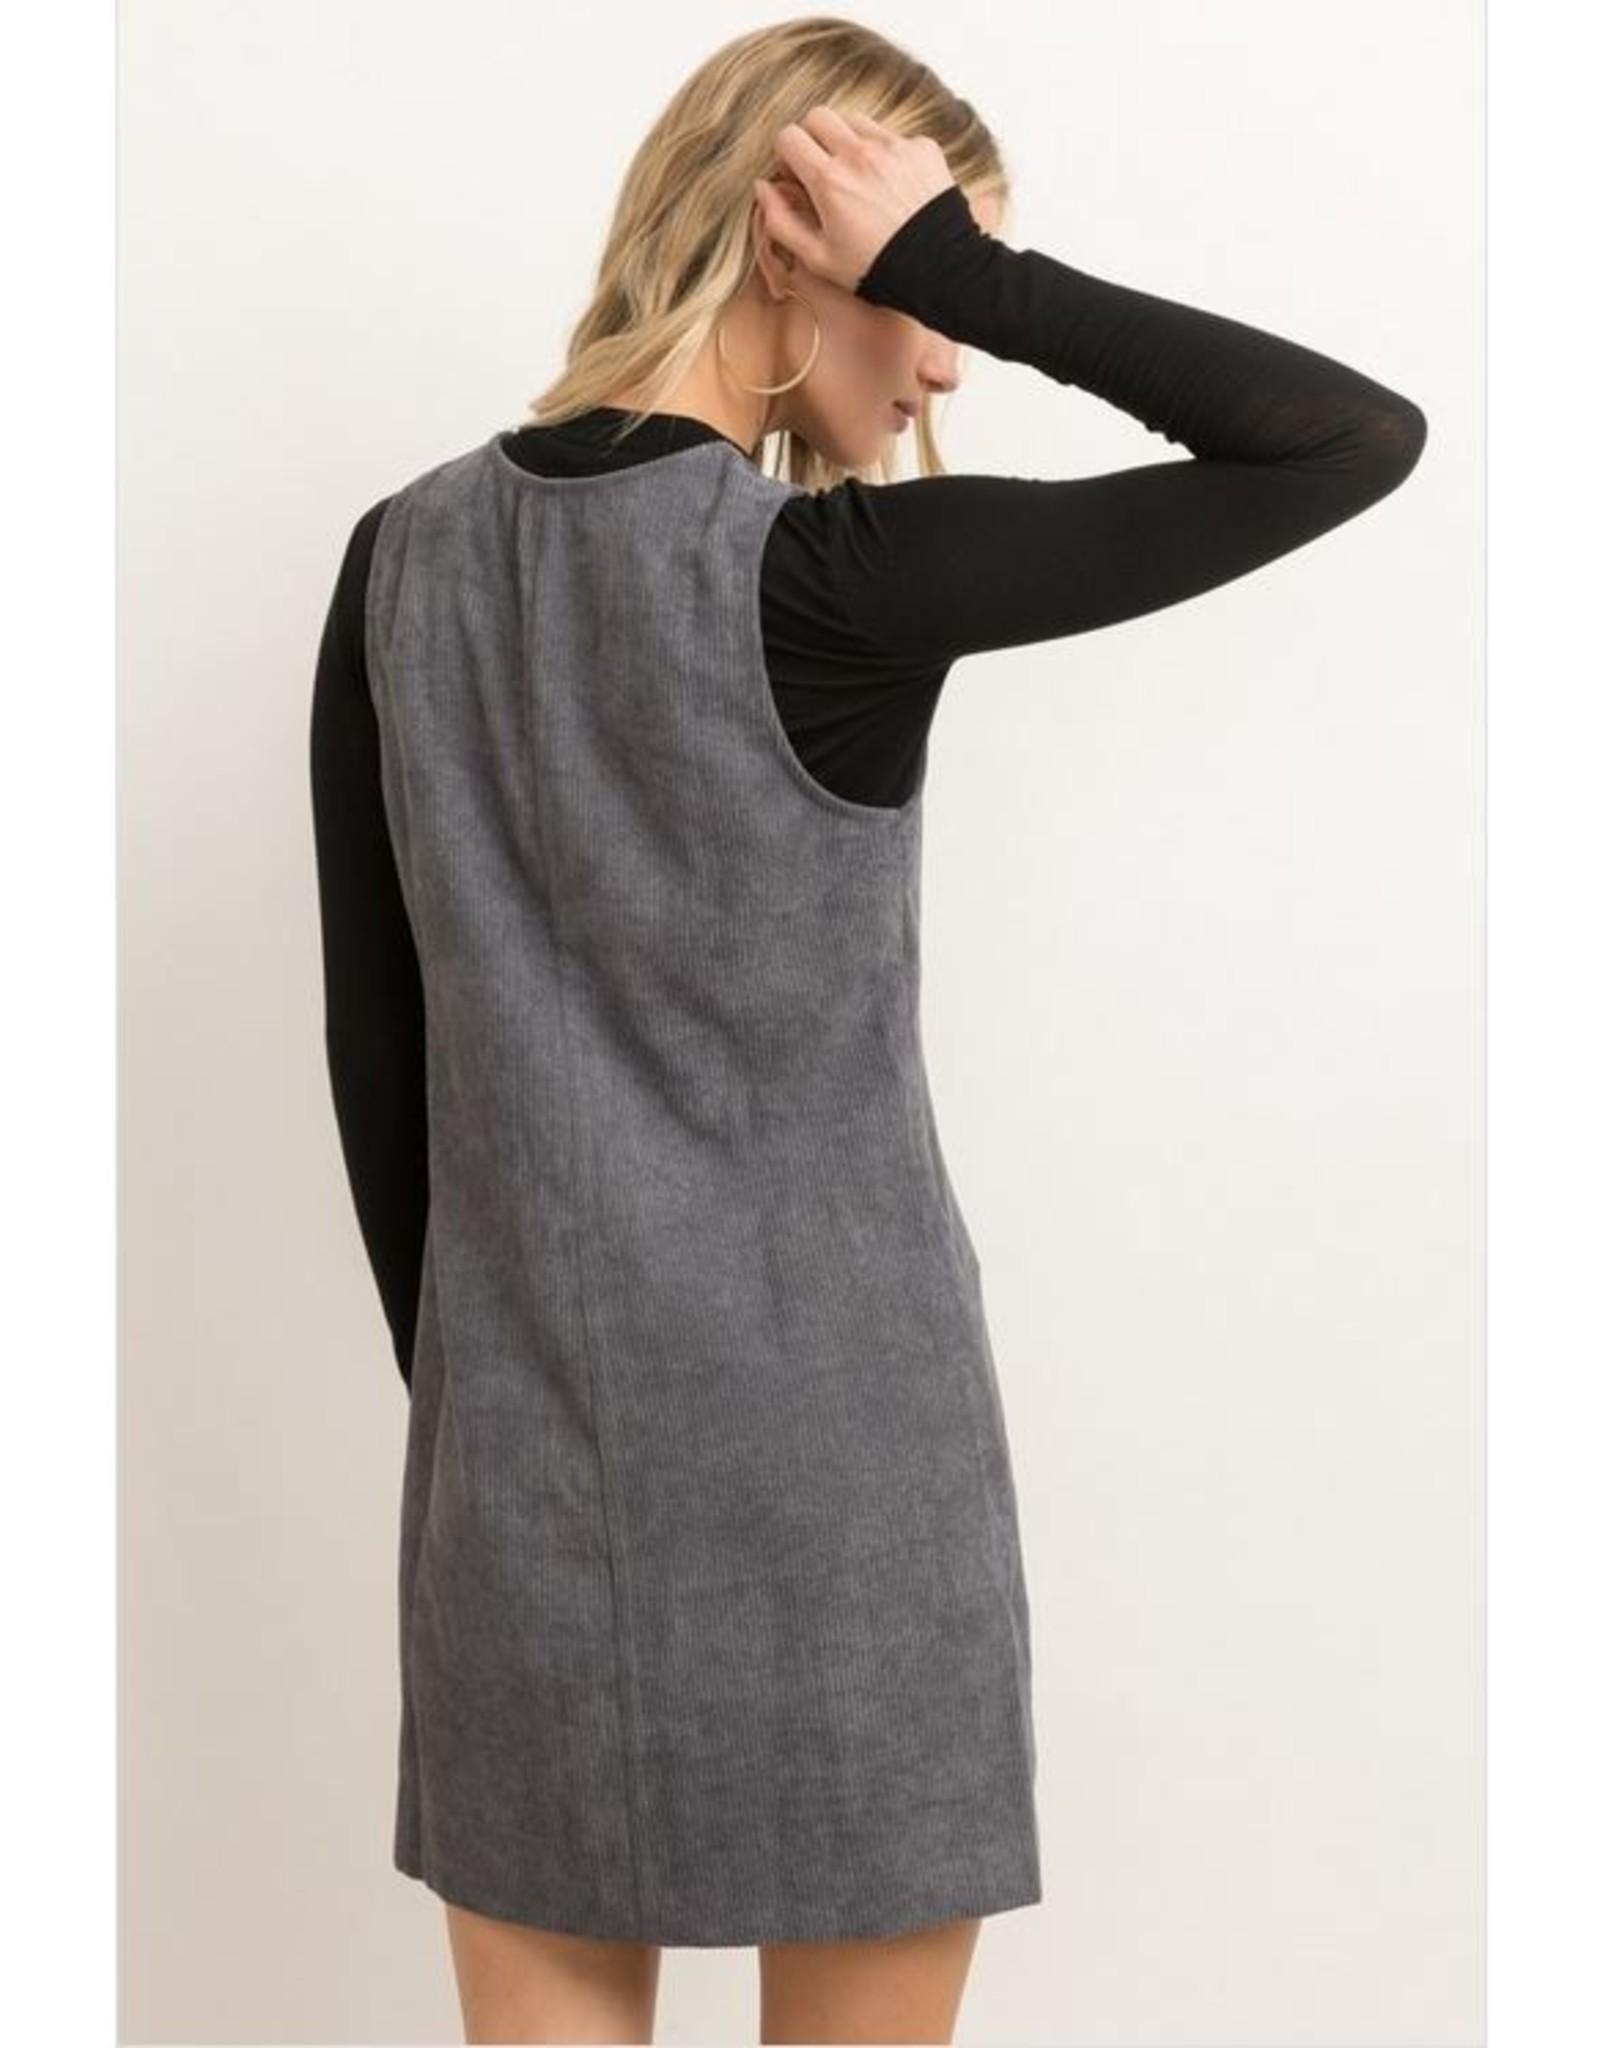 CHARCOAL ZIP FRONT CORDUROY SLEEVELESS DRESS